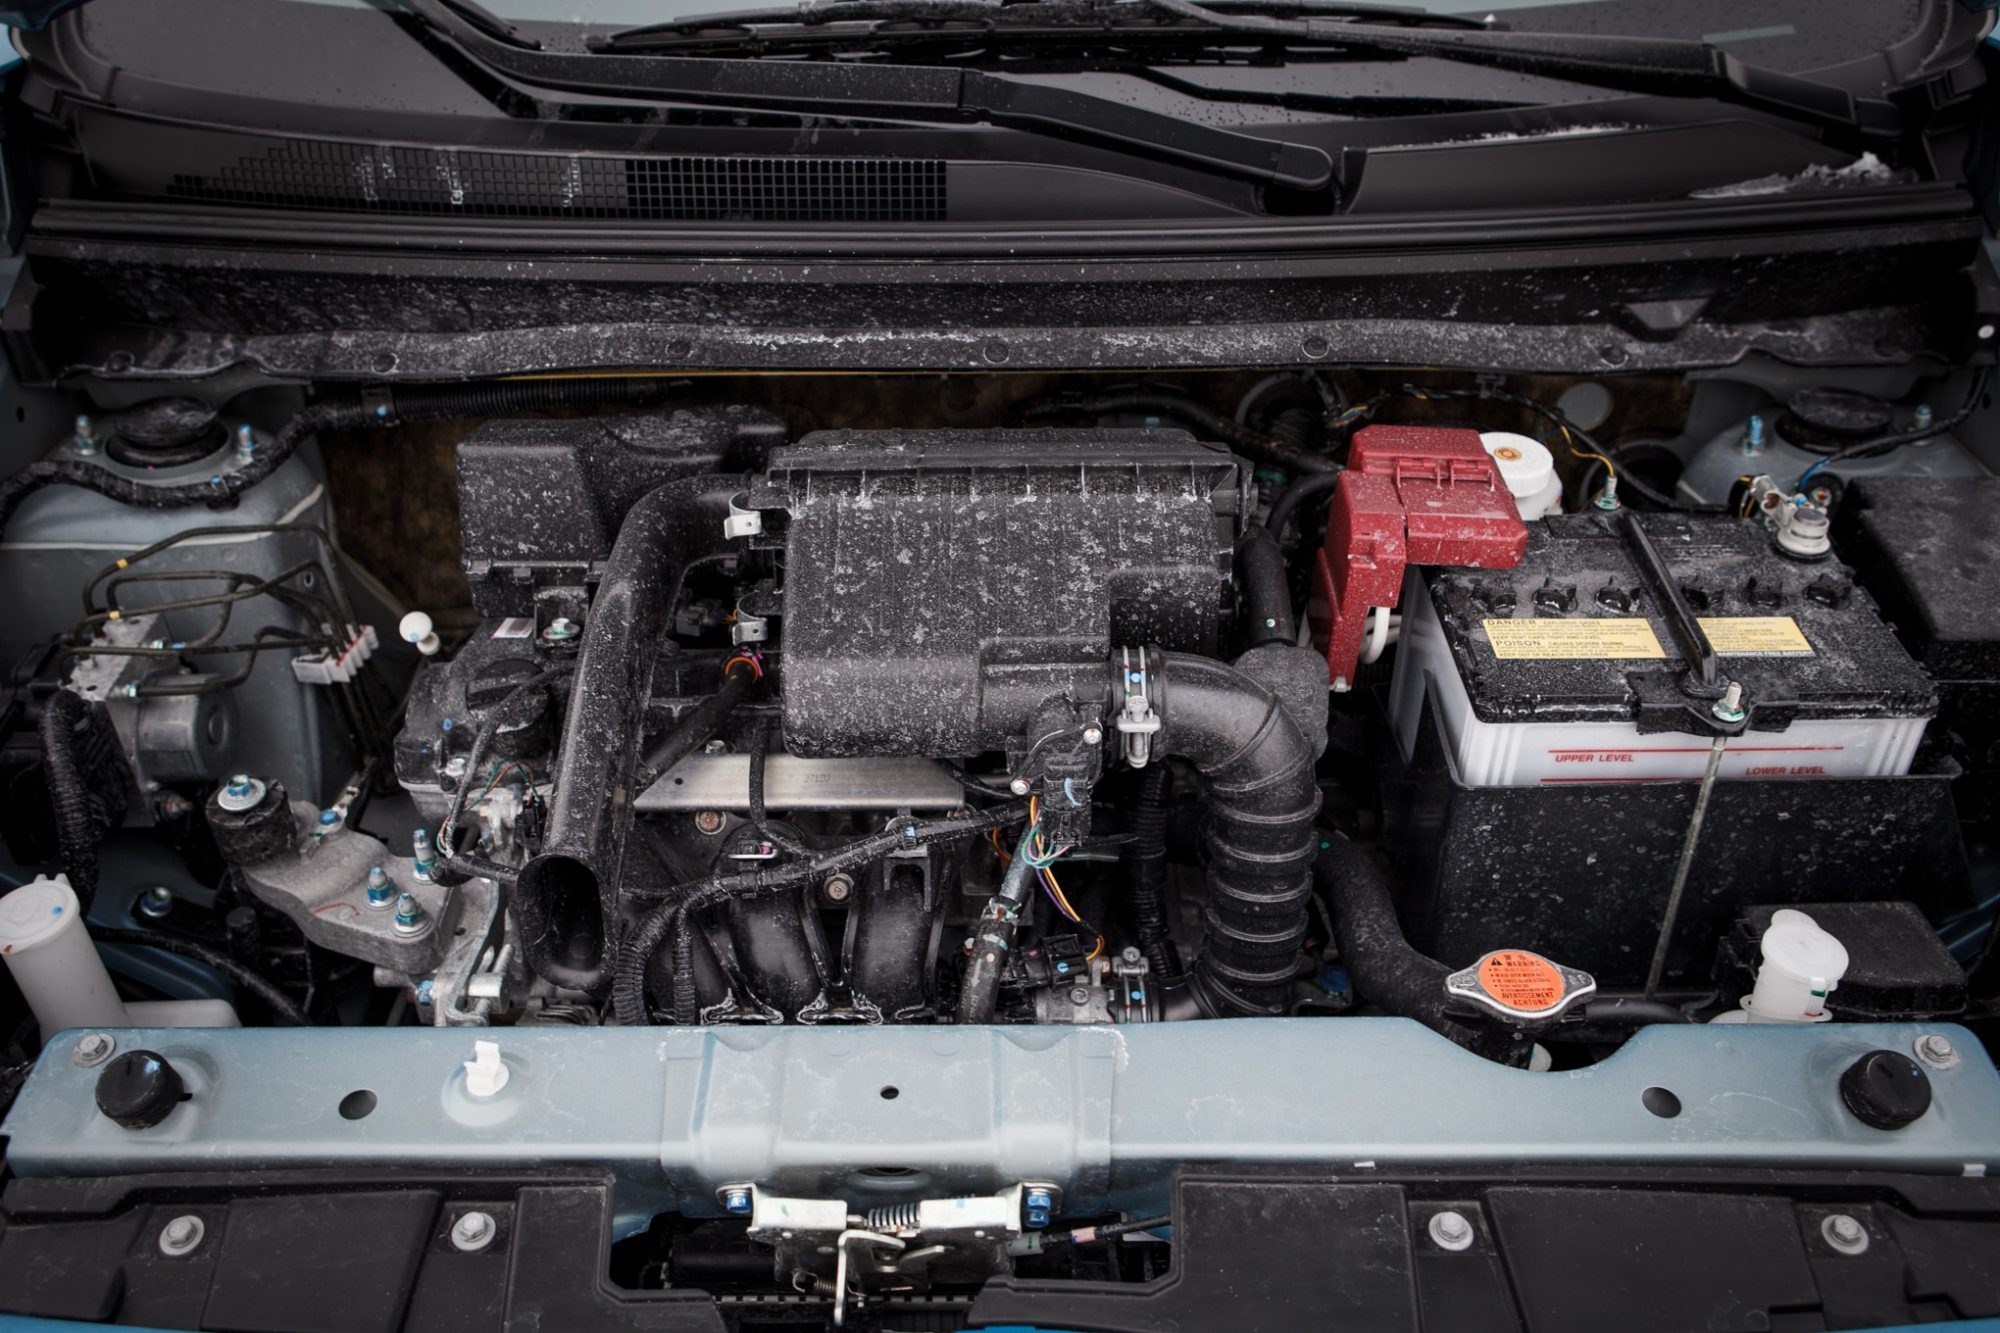 hight resolution of 2014 mitsubishi mirage engine diagram wiring diagrams img 2000 mitsubishi engine diagram 2014 mitsubishi mirage engine diagram